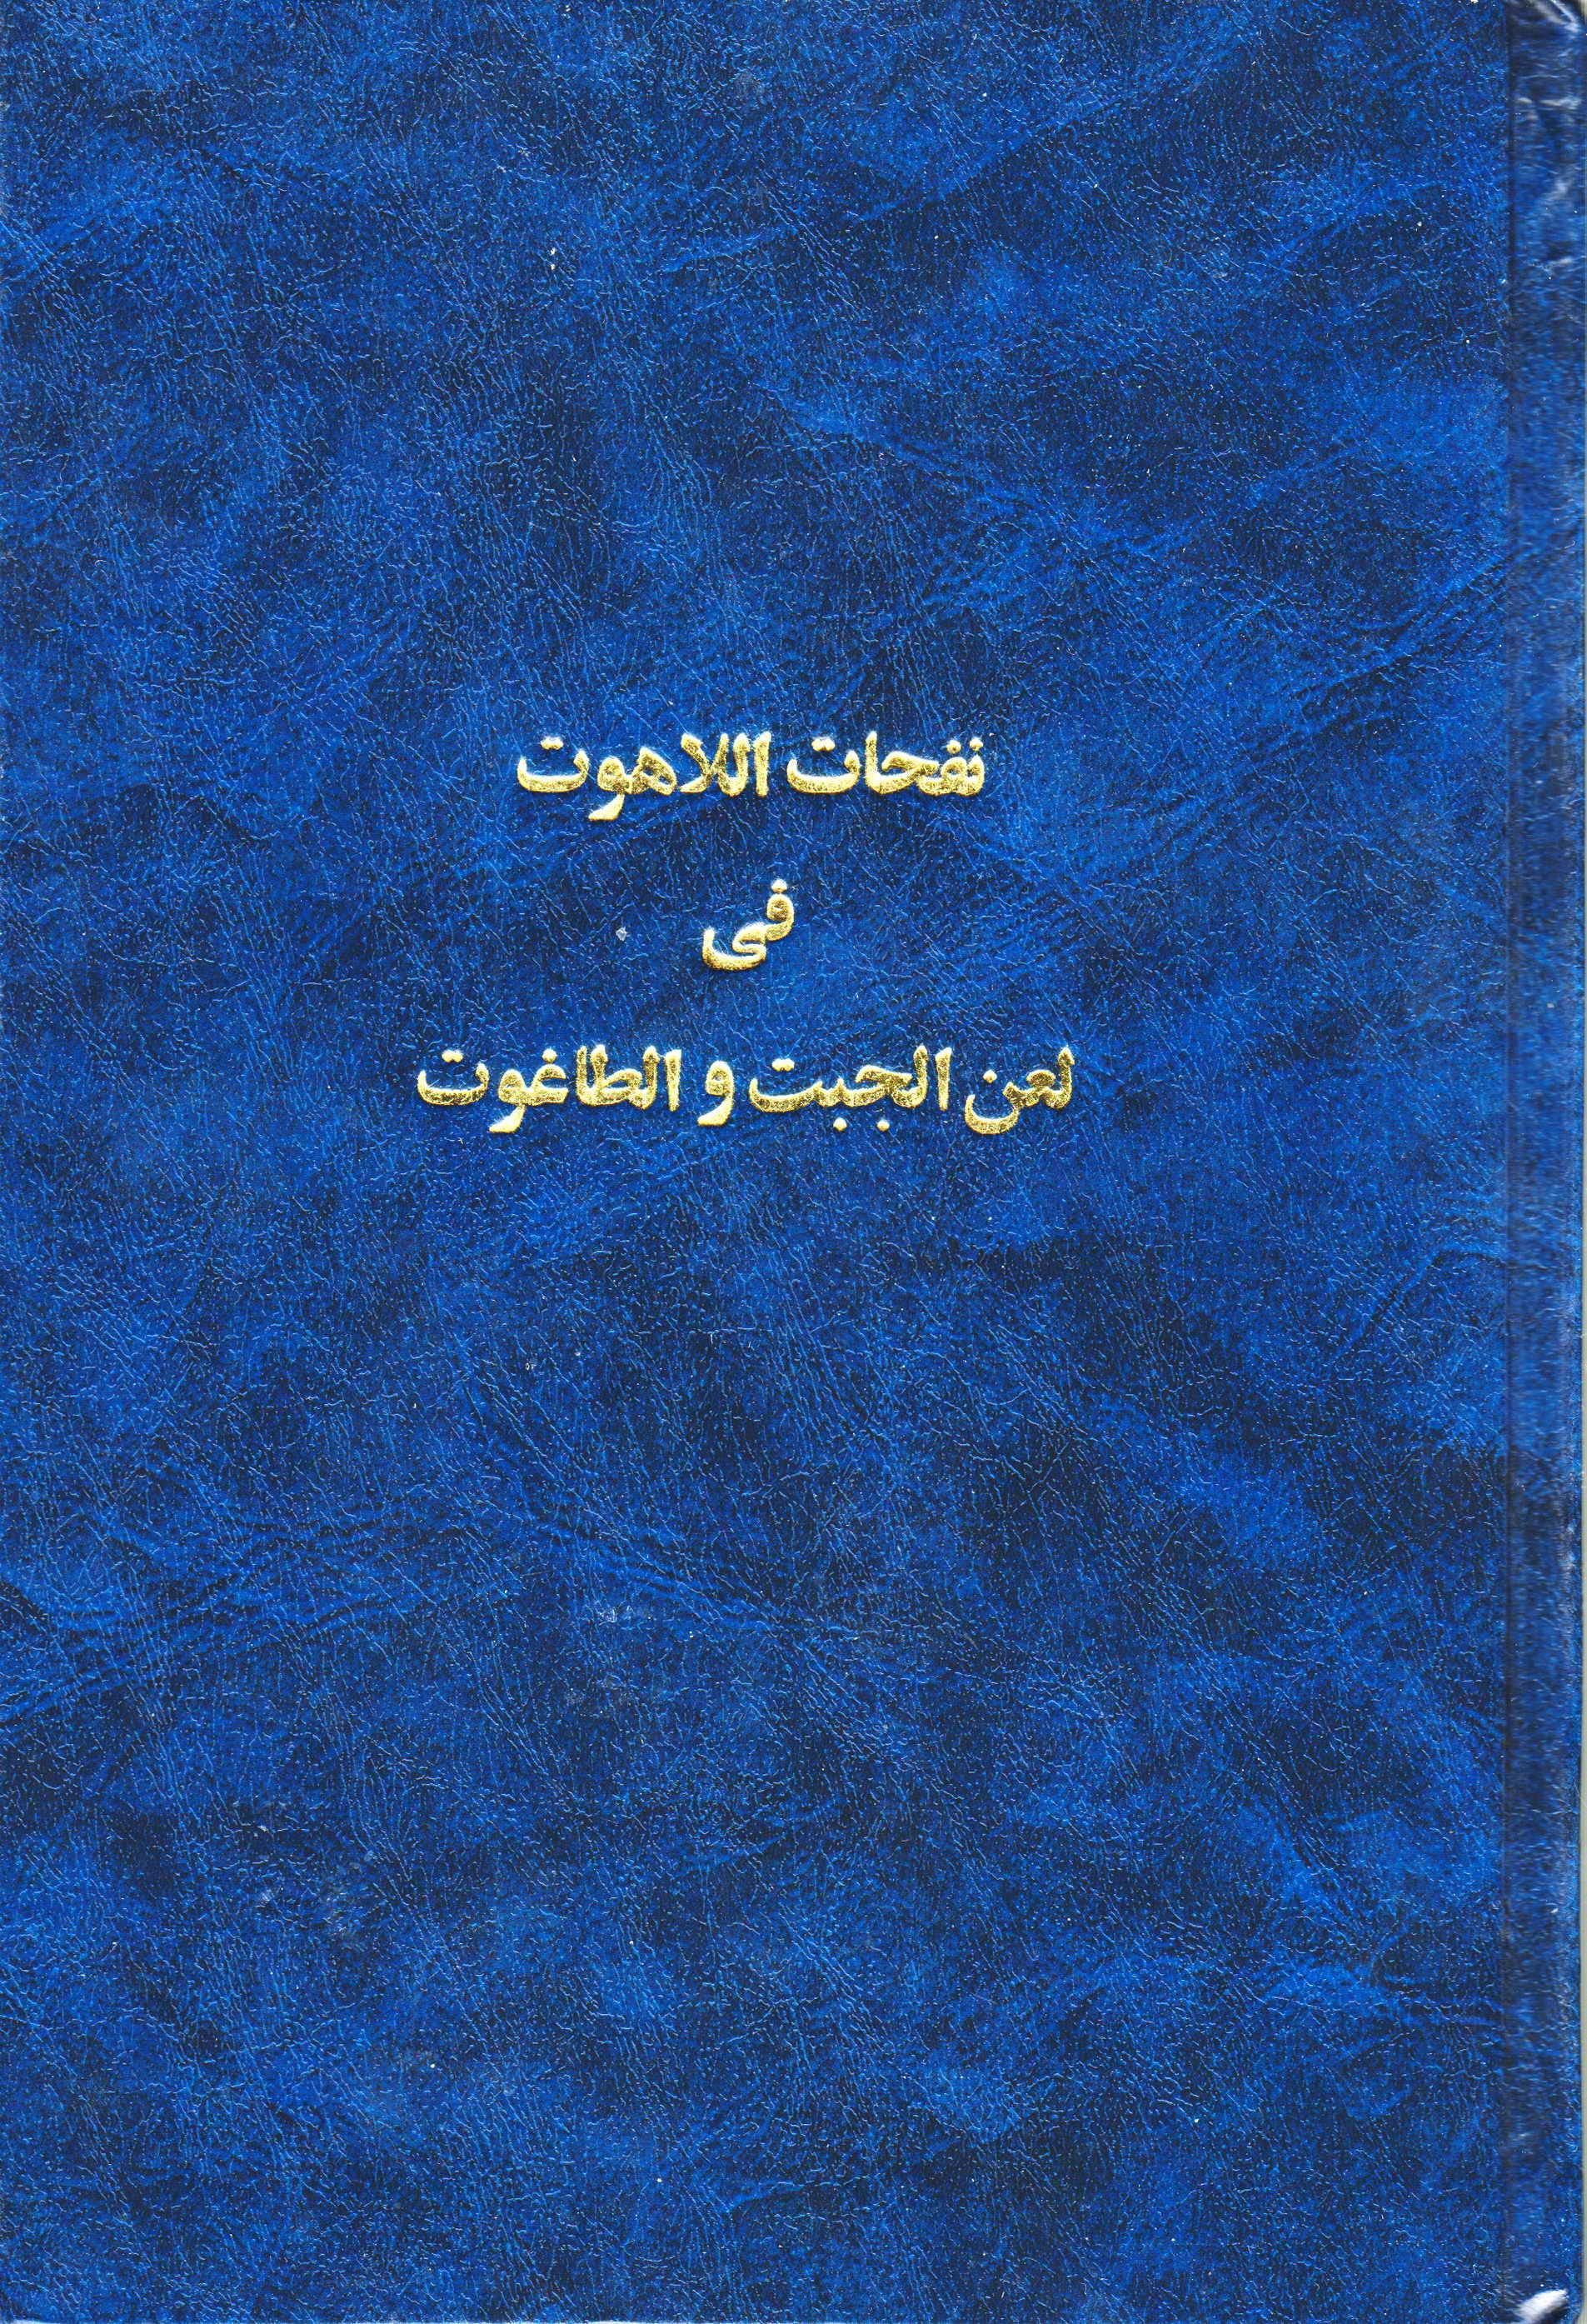 دانلود ترجمه فارسی کتاب نفحات اللاهوت فی العن الجبت و الطاغوت